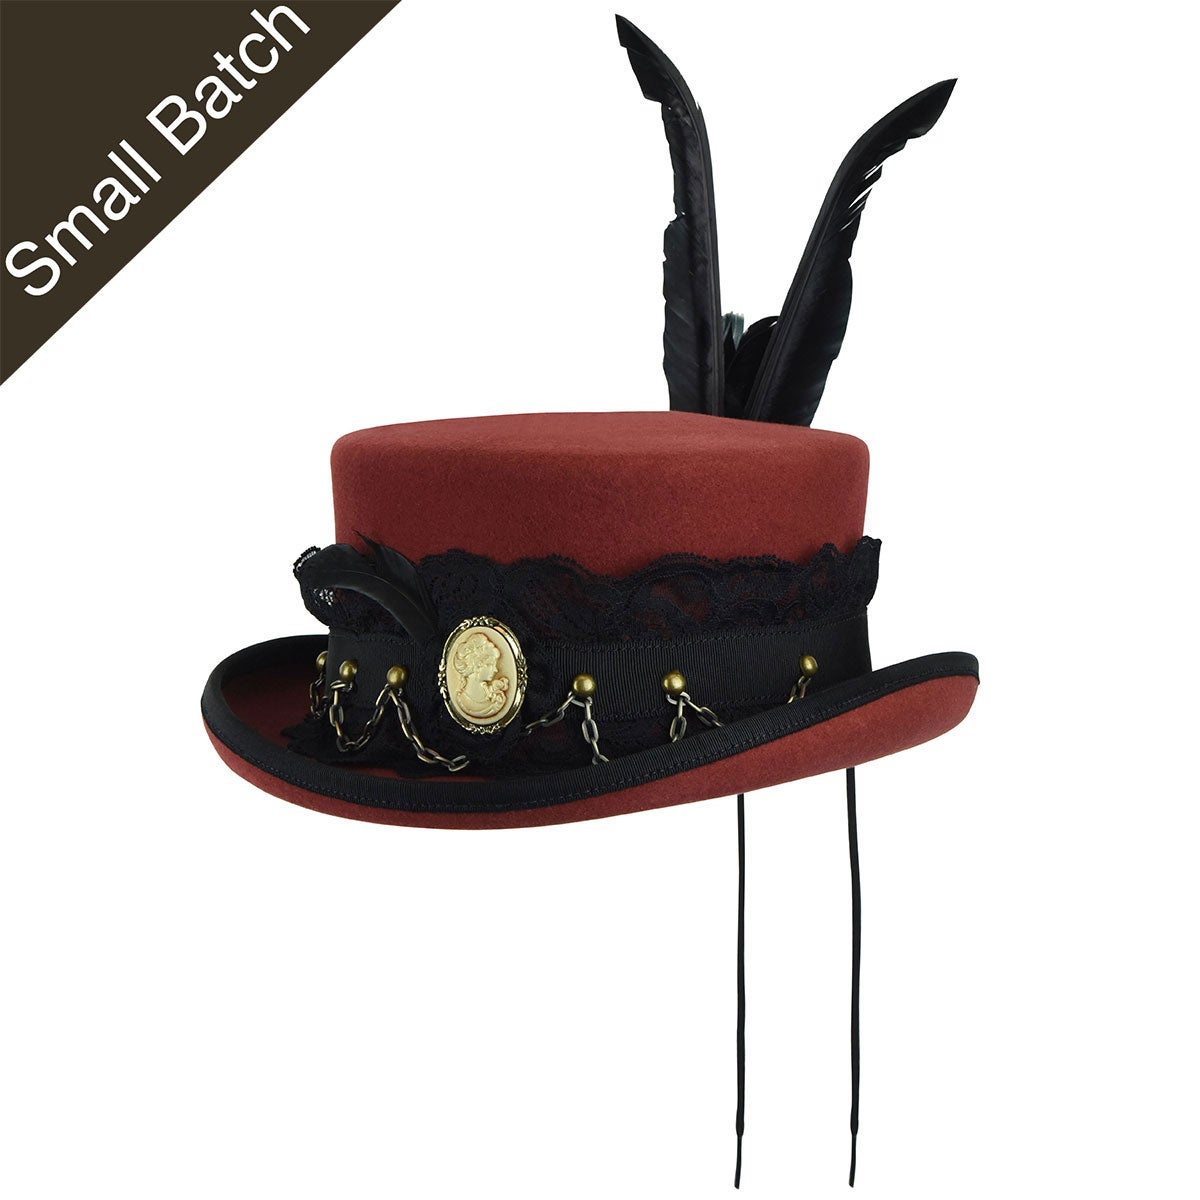 Steampunk Hats | Top Hats | Bowler Mohn Topper $300.00 AT vintagedancer.com